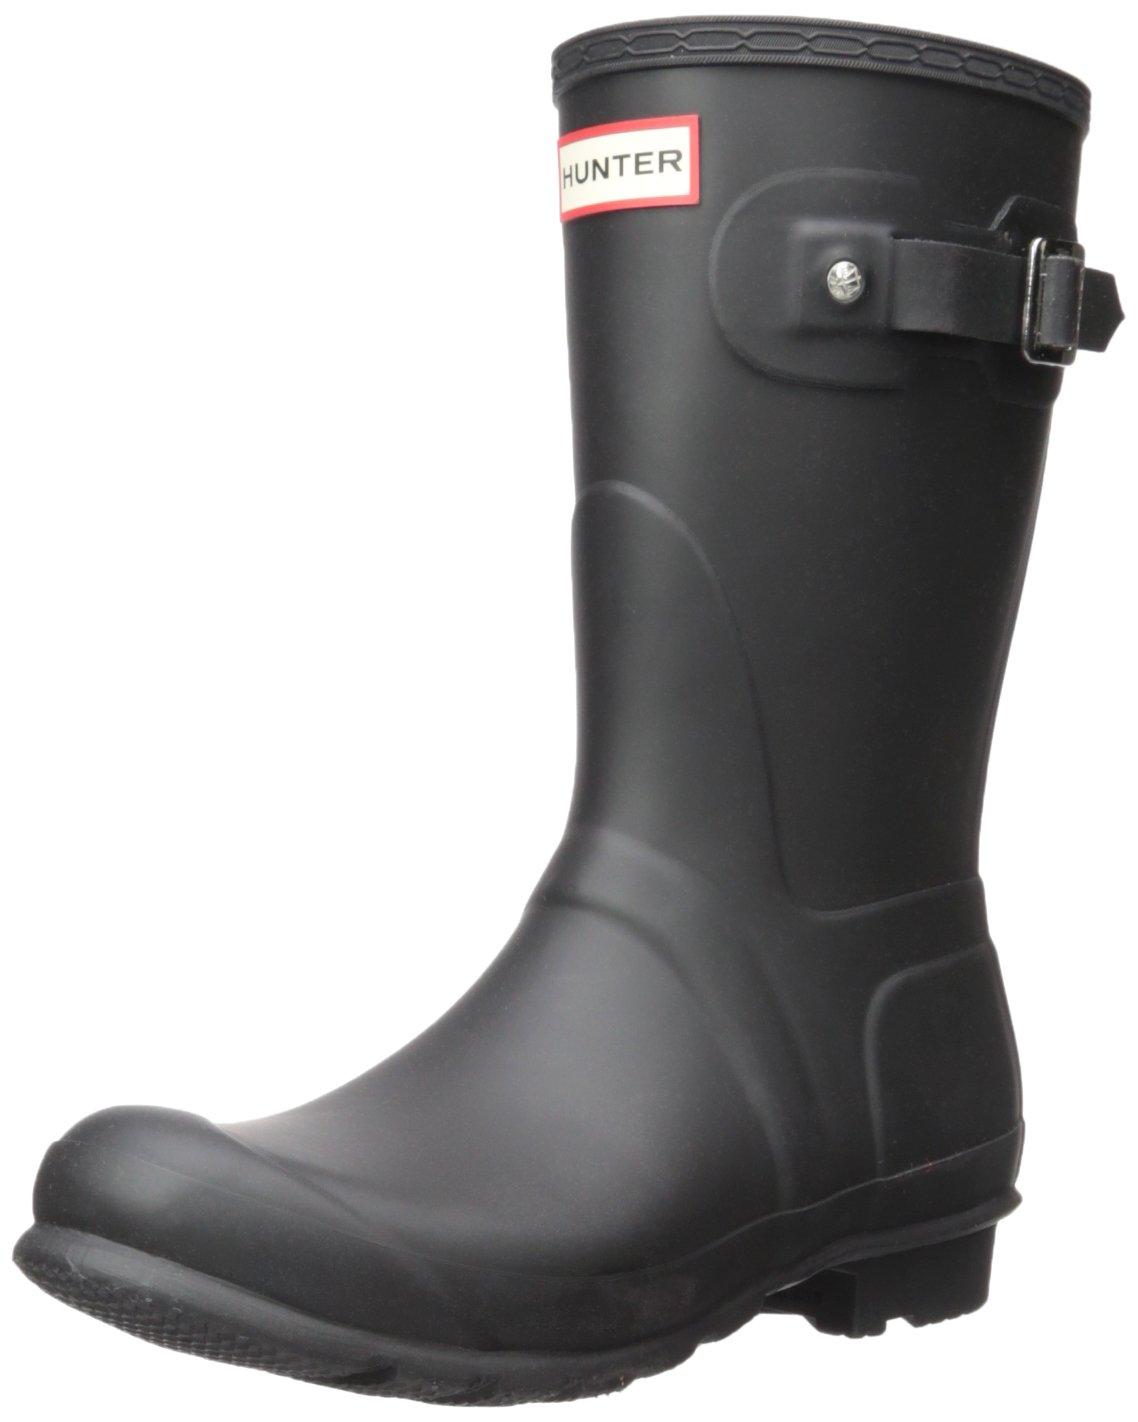 Hunter Women's Original Short Rain Boot B07D18XKHB 7 M US|Black